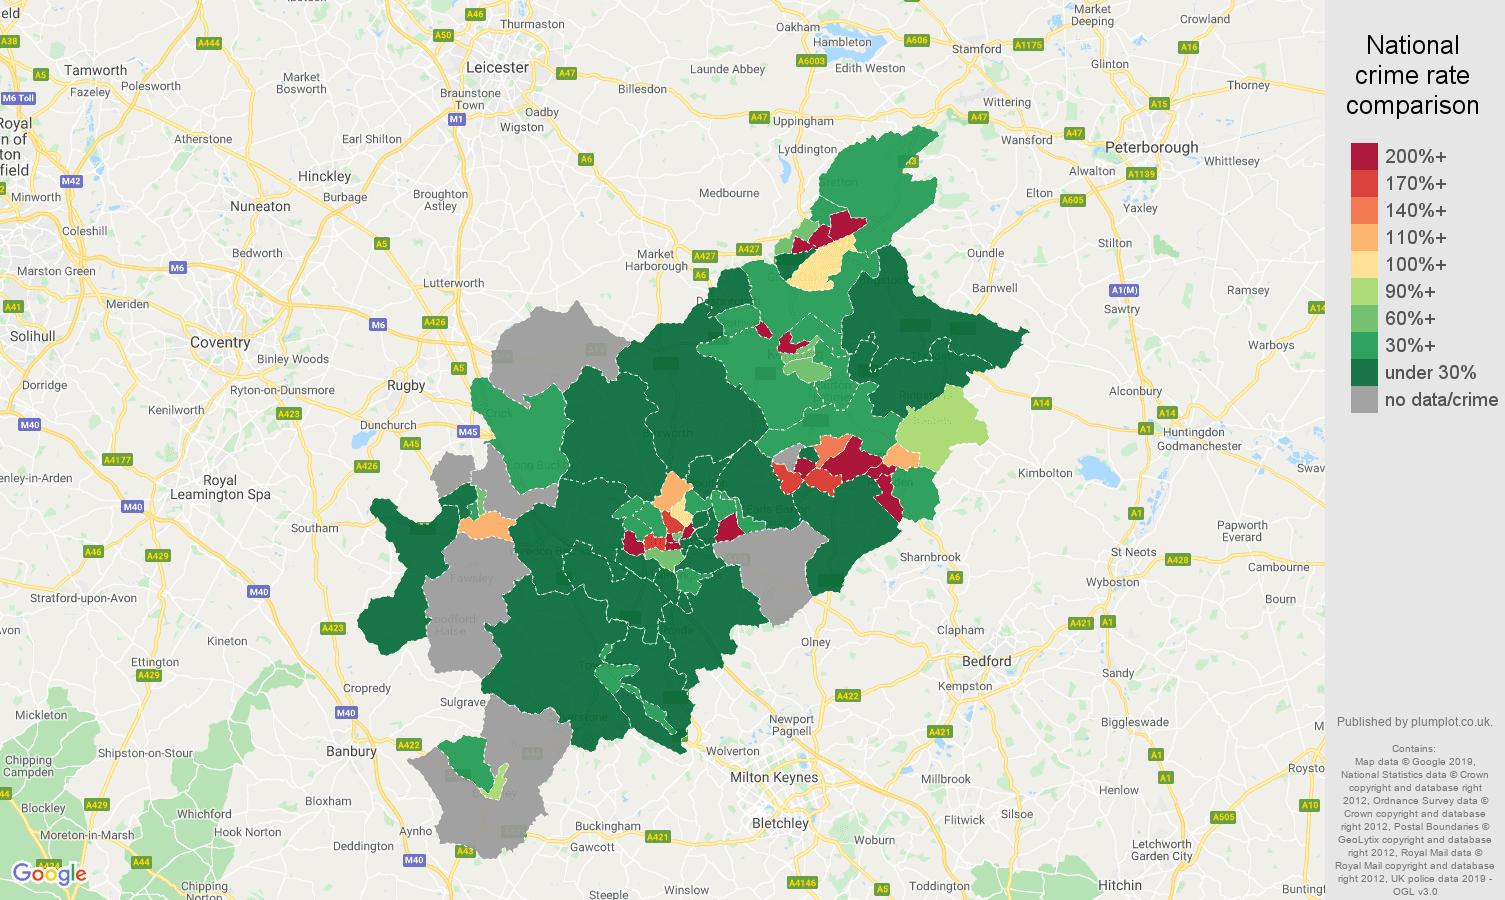 Northampton shoplifting crime rate comparison map